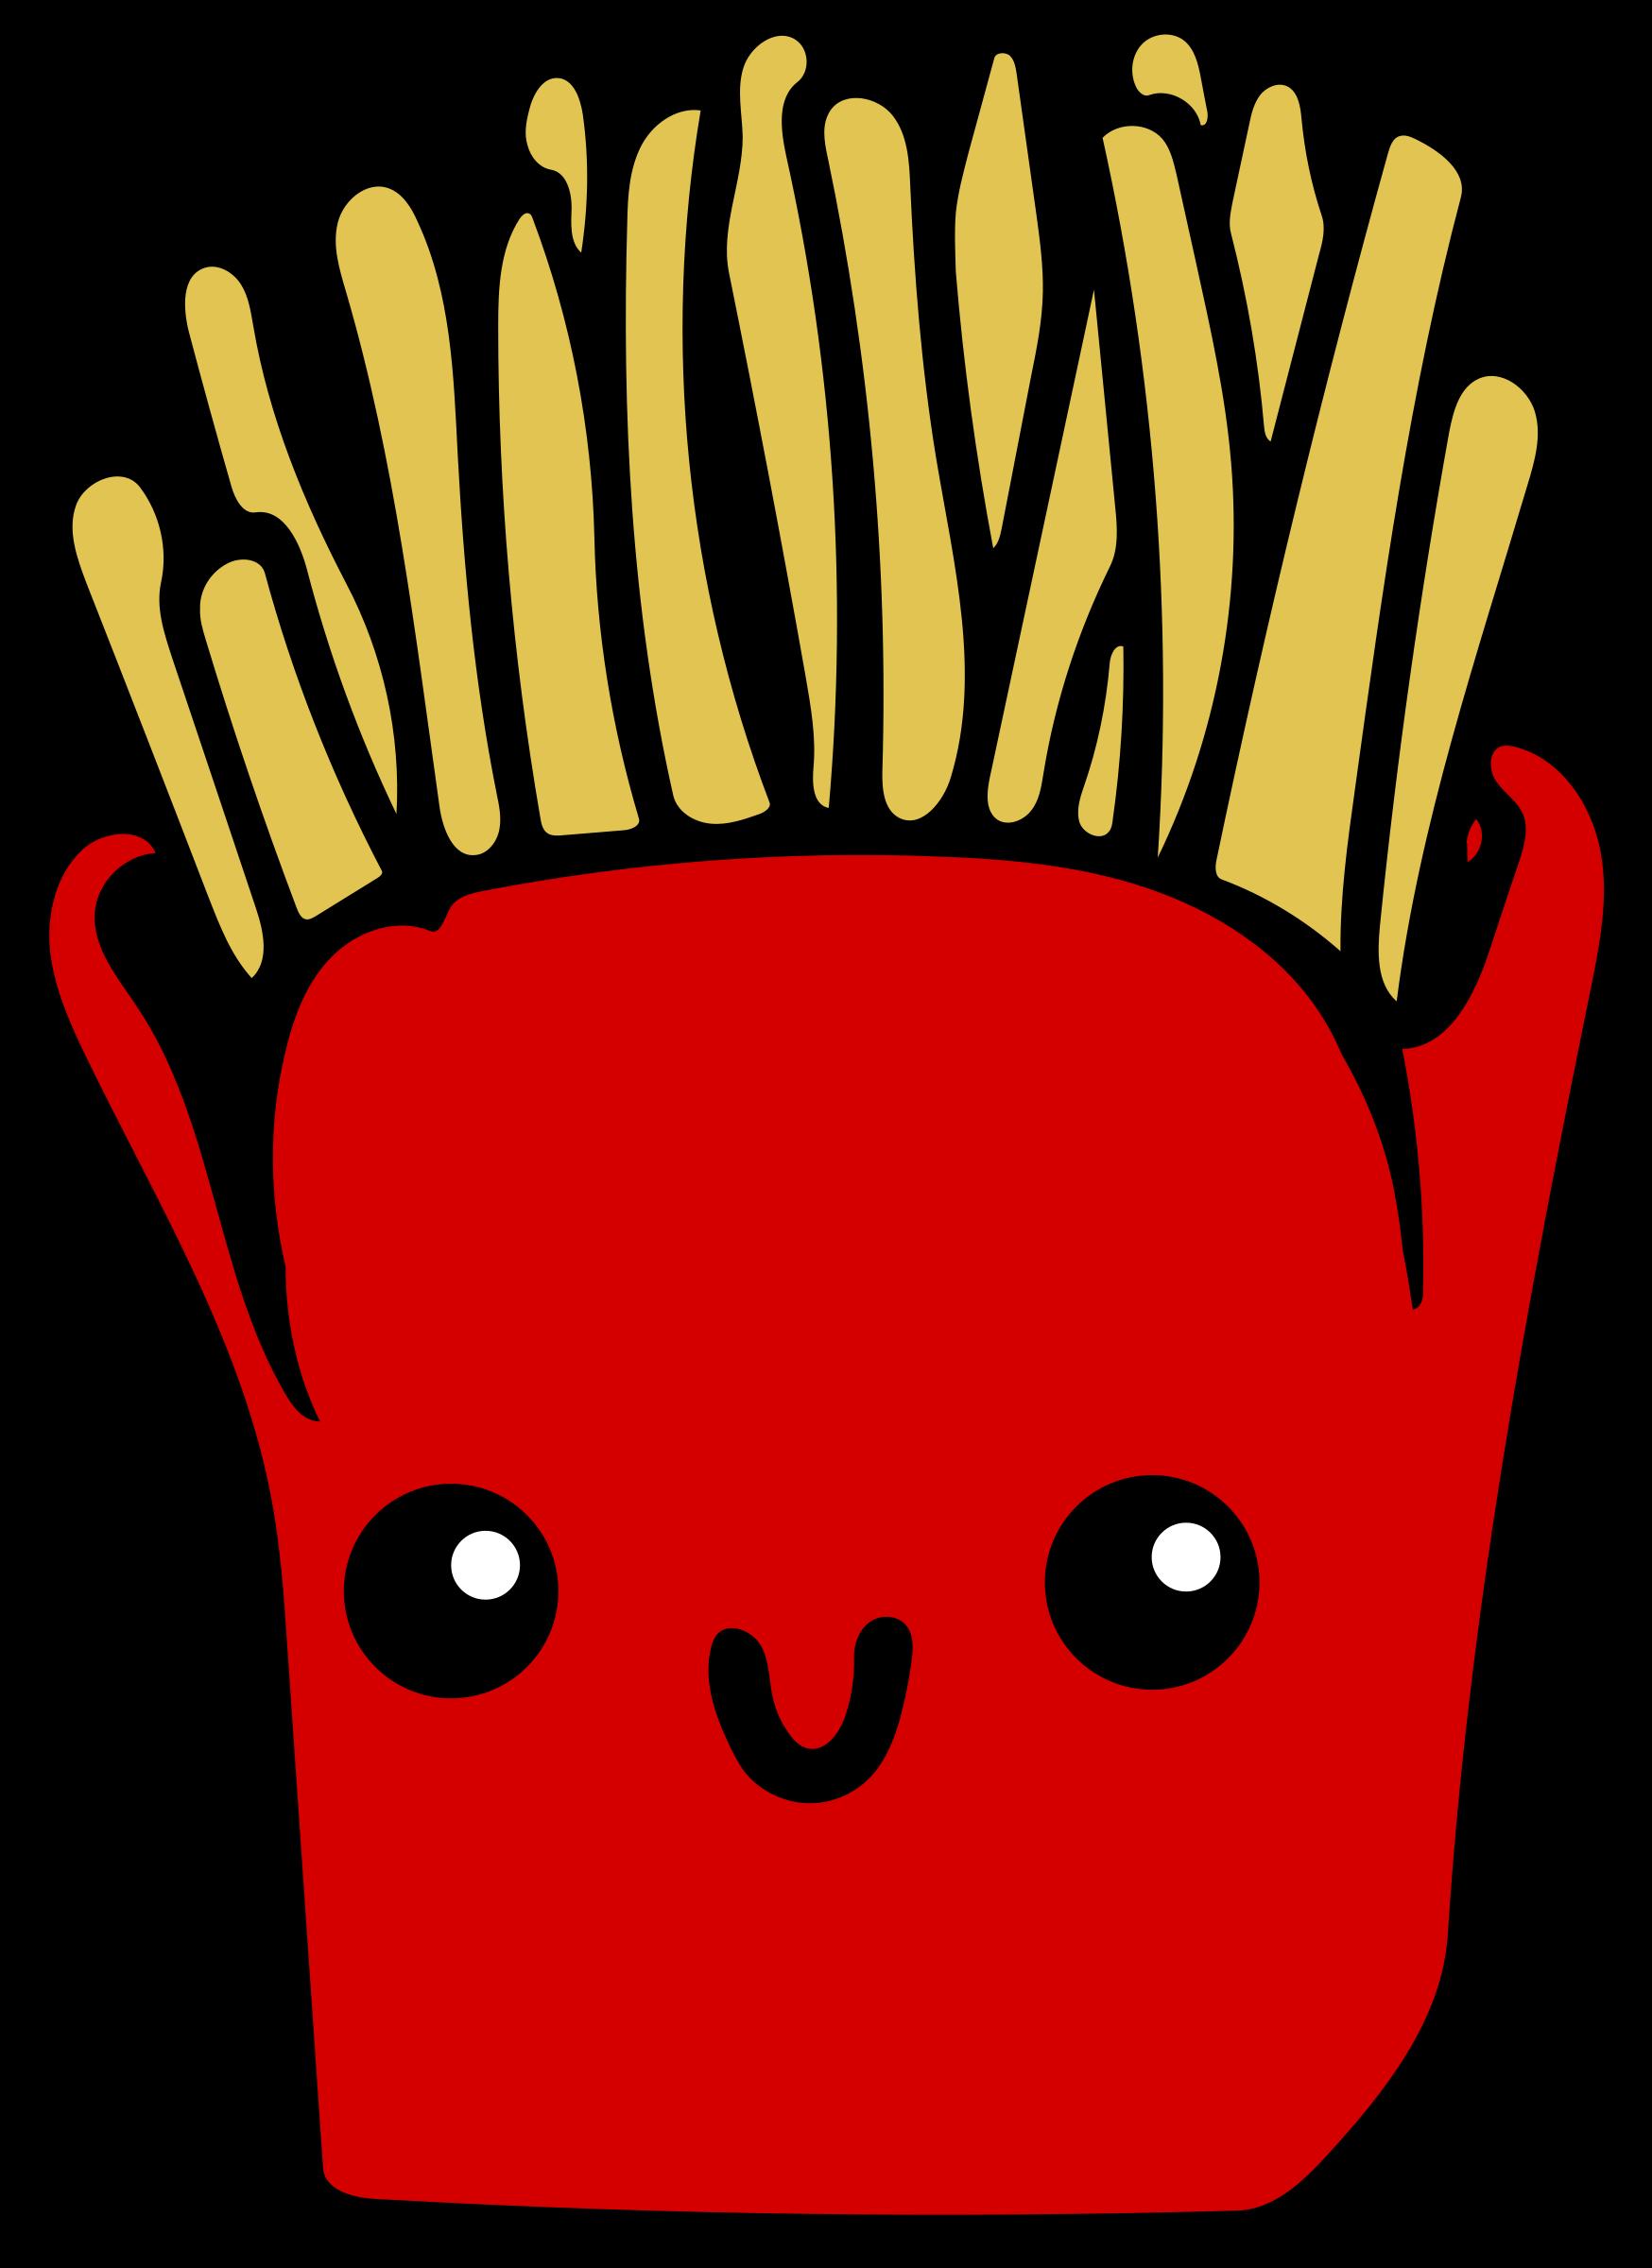 Kawaii Fries Vector Clipart image.